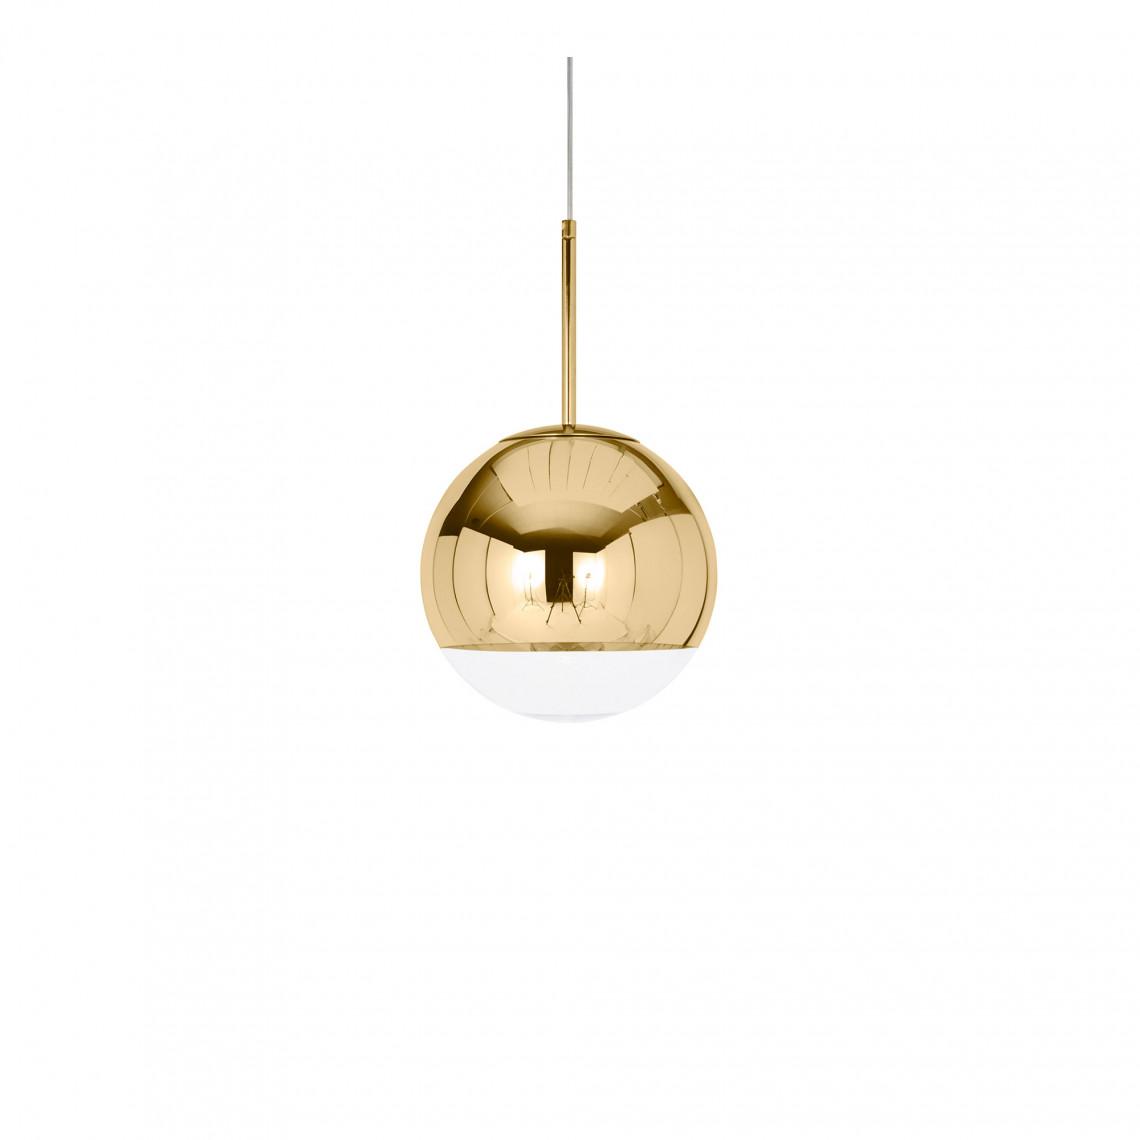 Mirror Ball - Gold